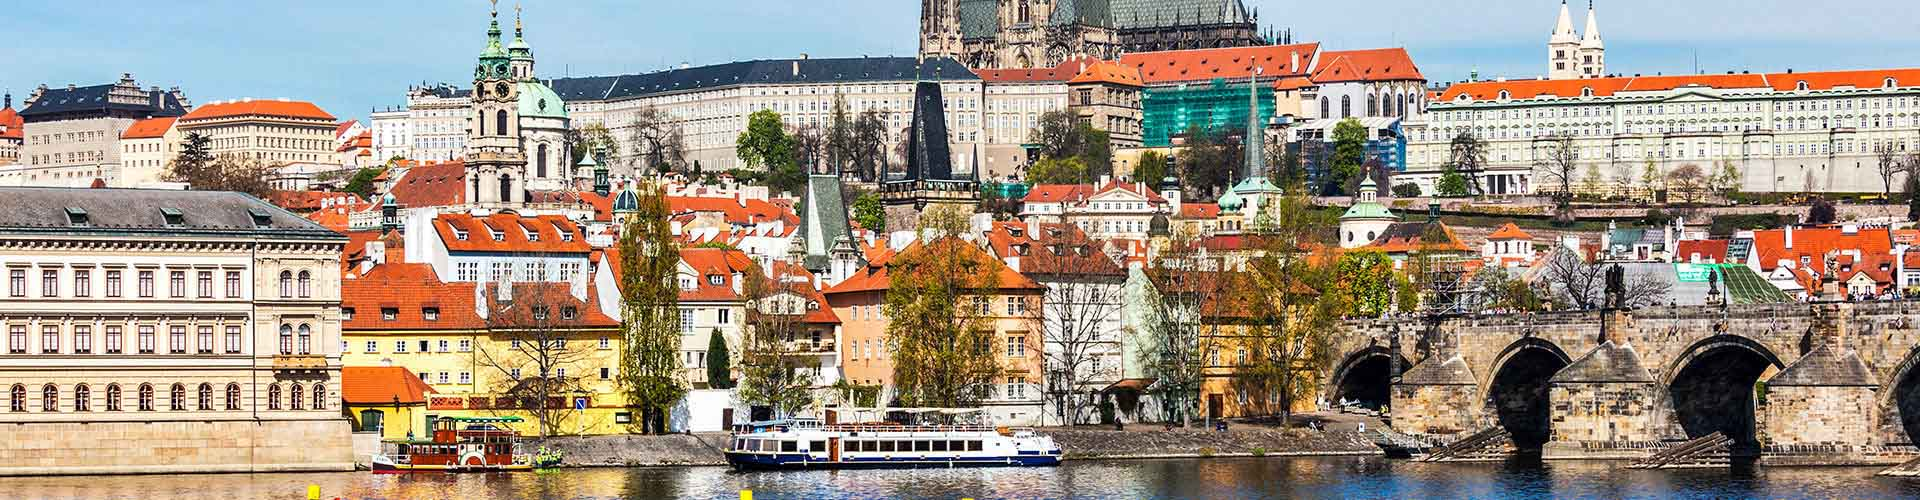 Praga - Albergues cerca a Catedral de San Vito. Mapas de Praga, Fotos y Comentarios para cada Albergue en Praga.